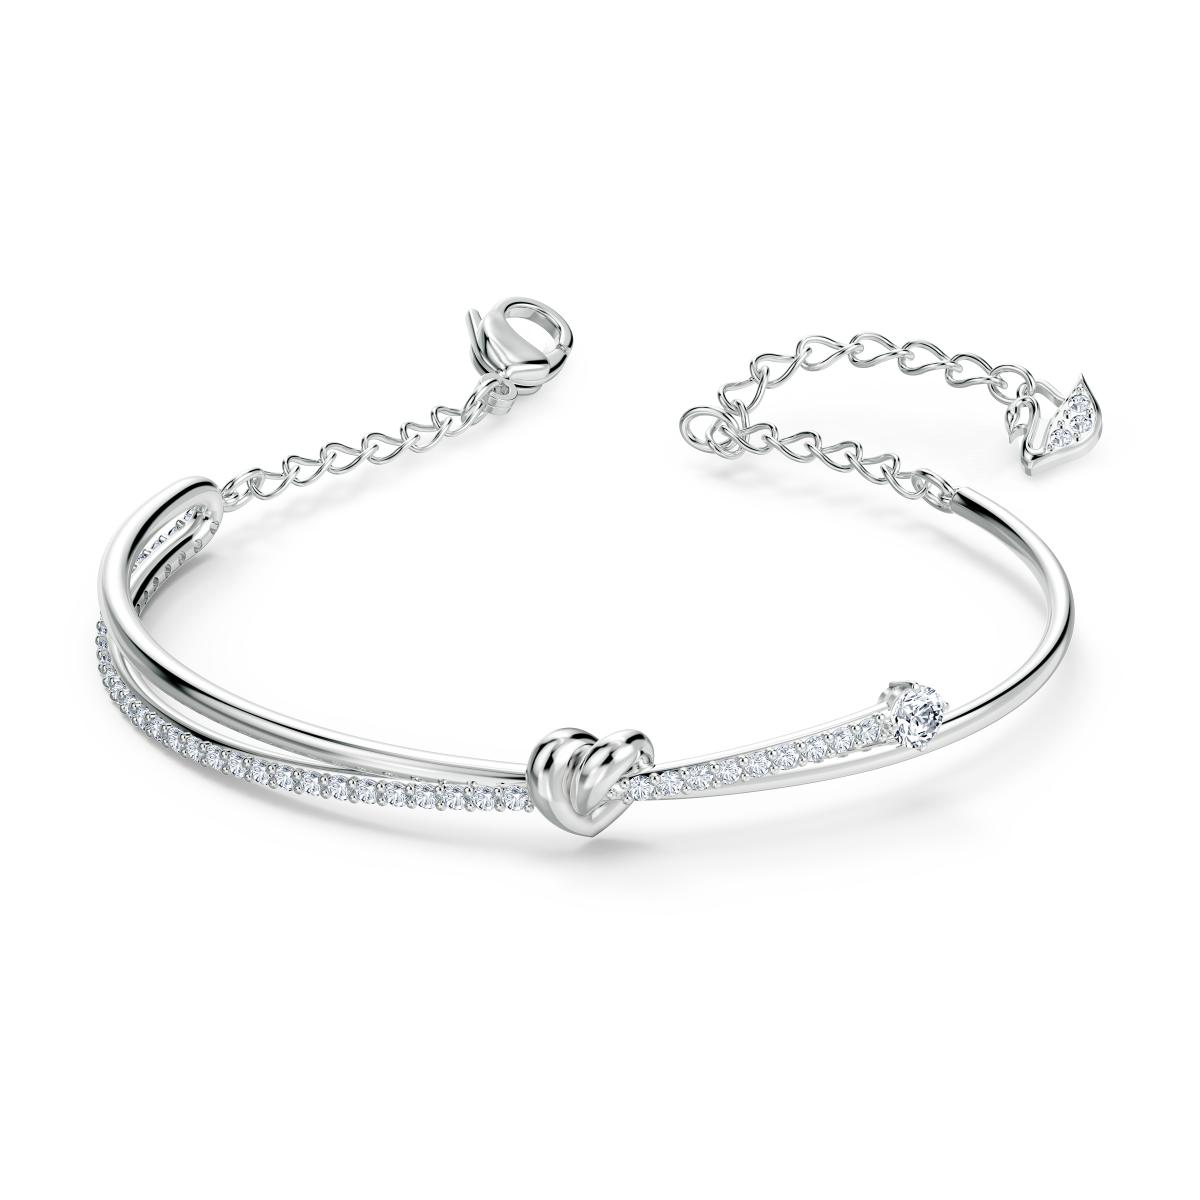 Bracelet Swarovski 5517944 - Bracelet métal rhodié blanc mini cœur Femme